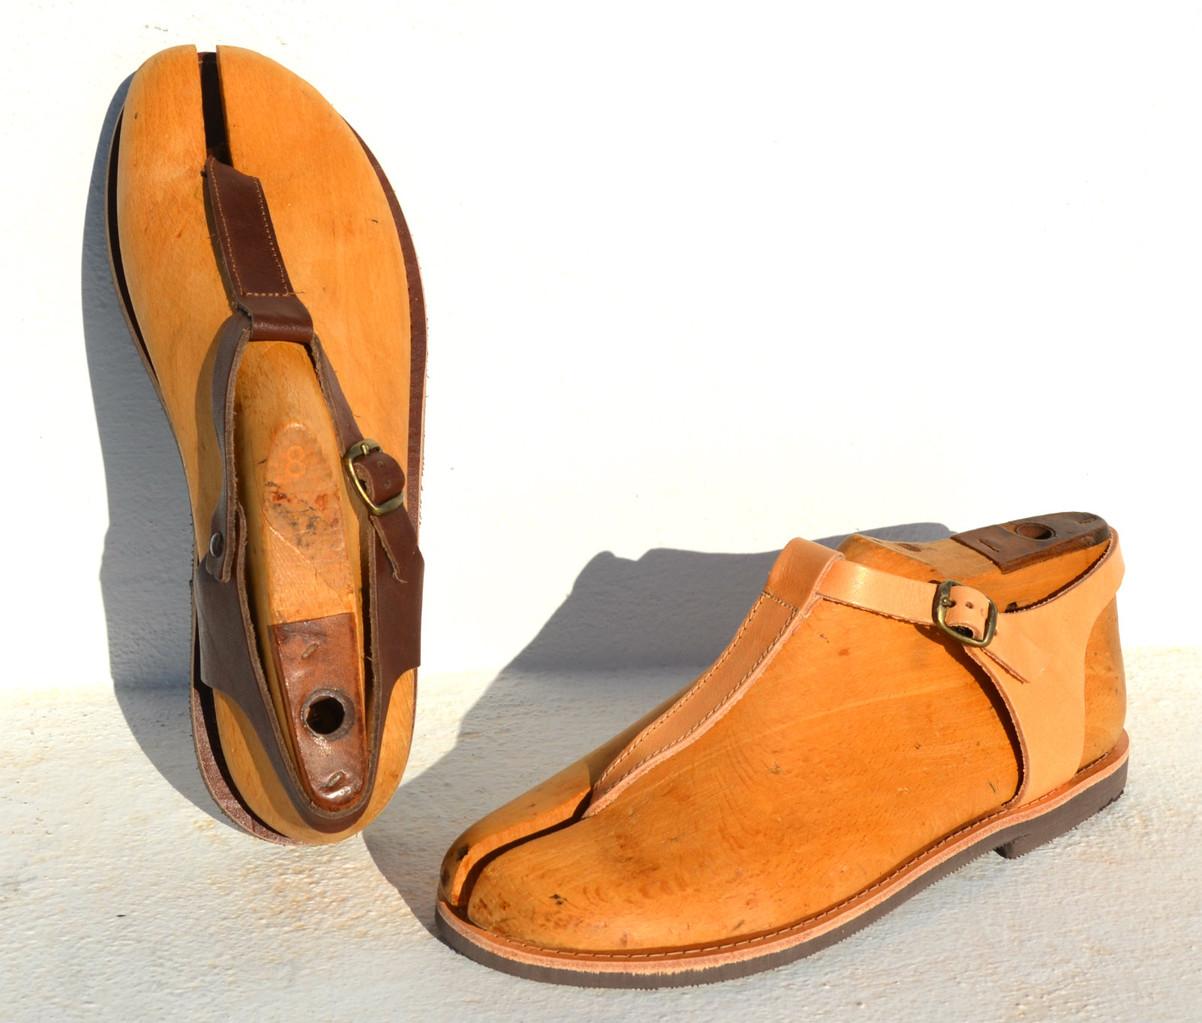 b7eeb3a54e12 Herren Zehentrenner - Ananias Sandals